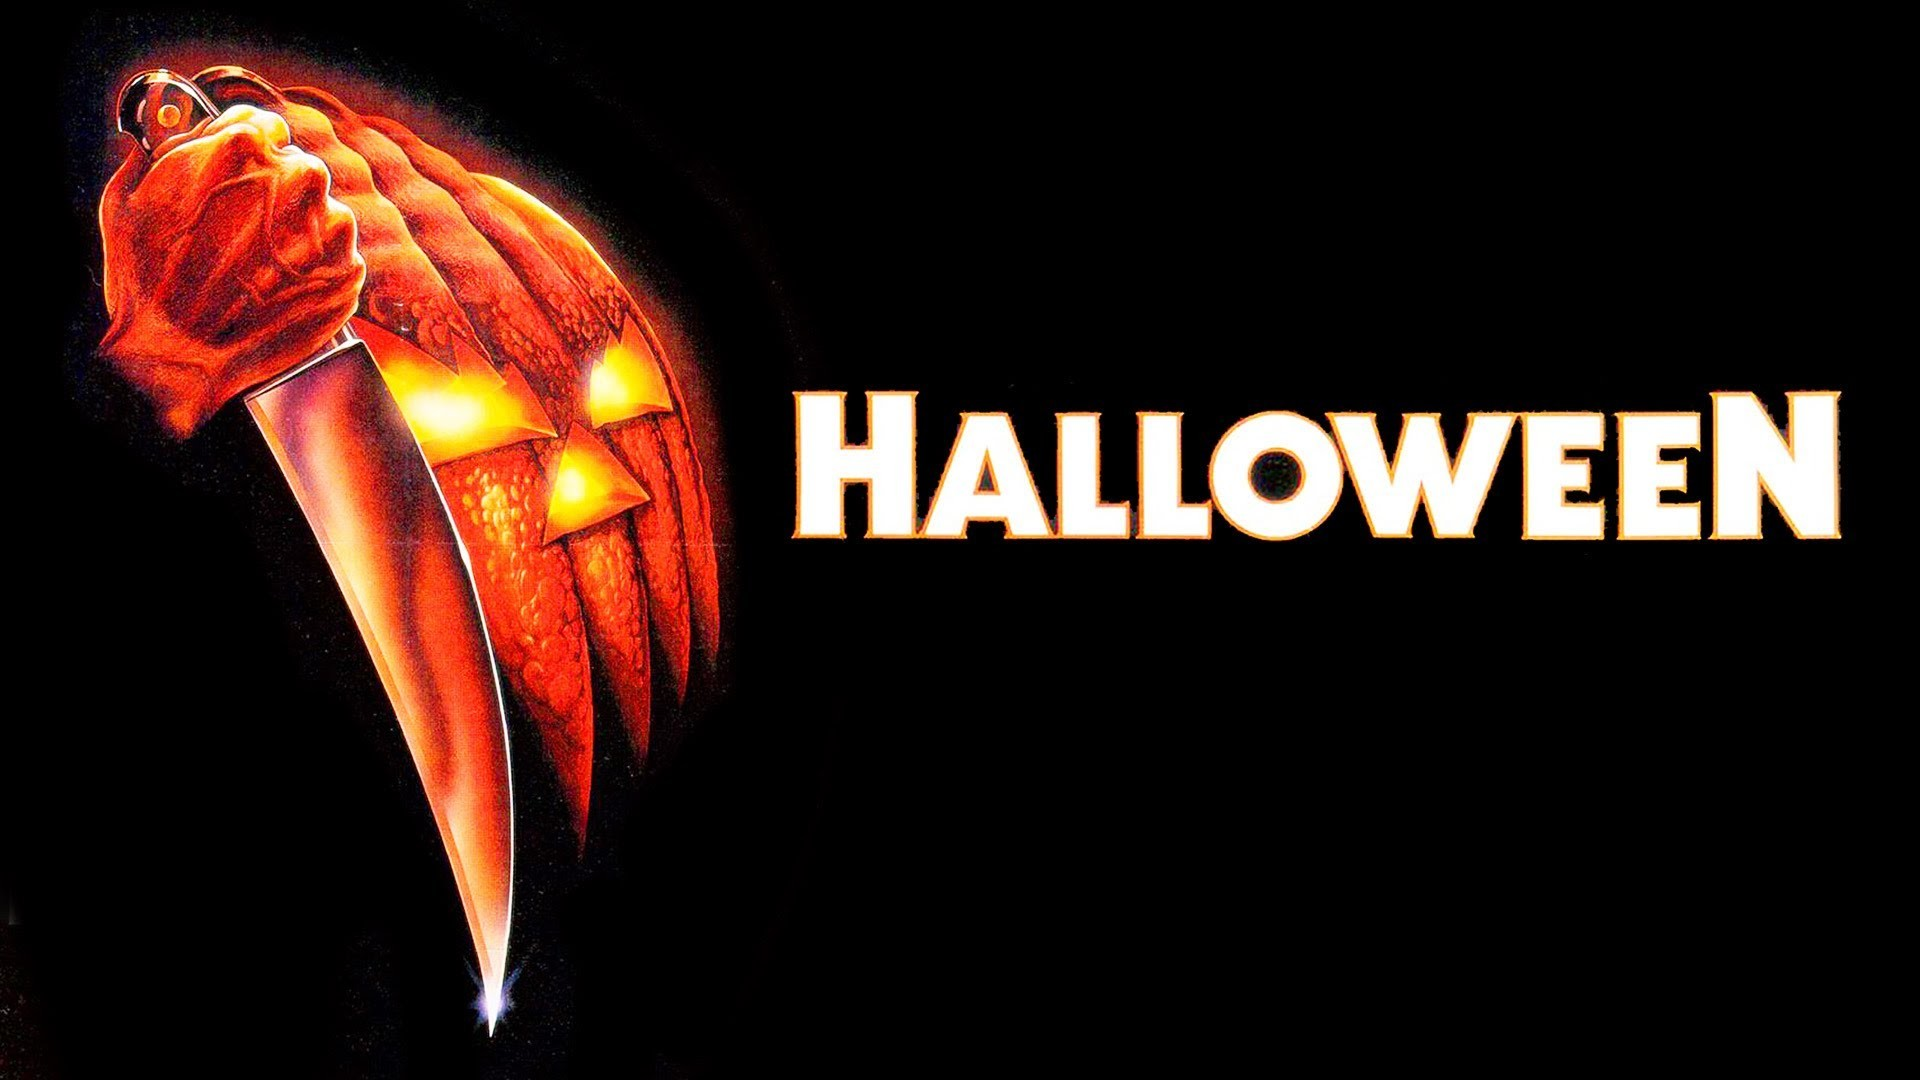 <b>Halloween Wallpaper</b> Backgrounds | Disney <b>Halloween